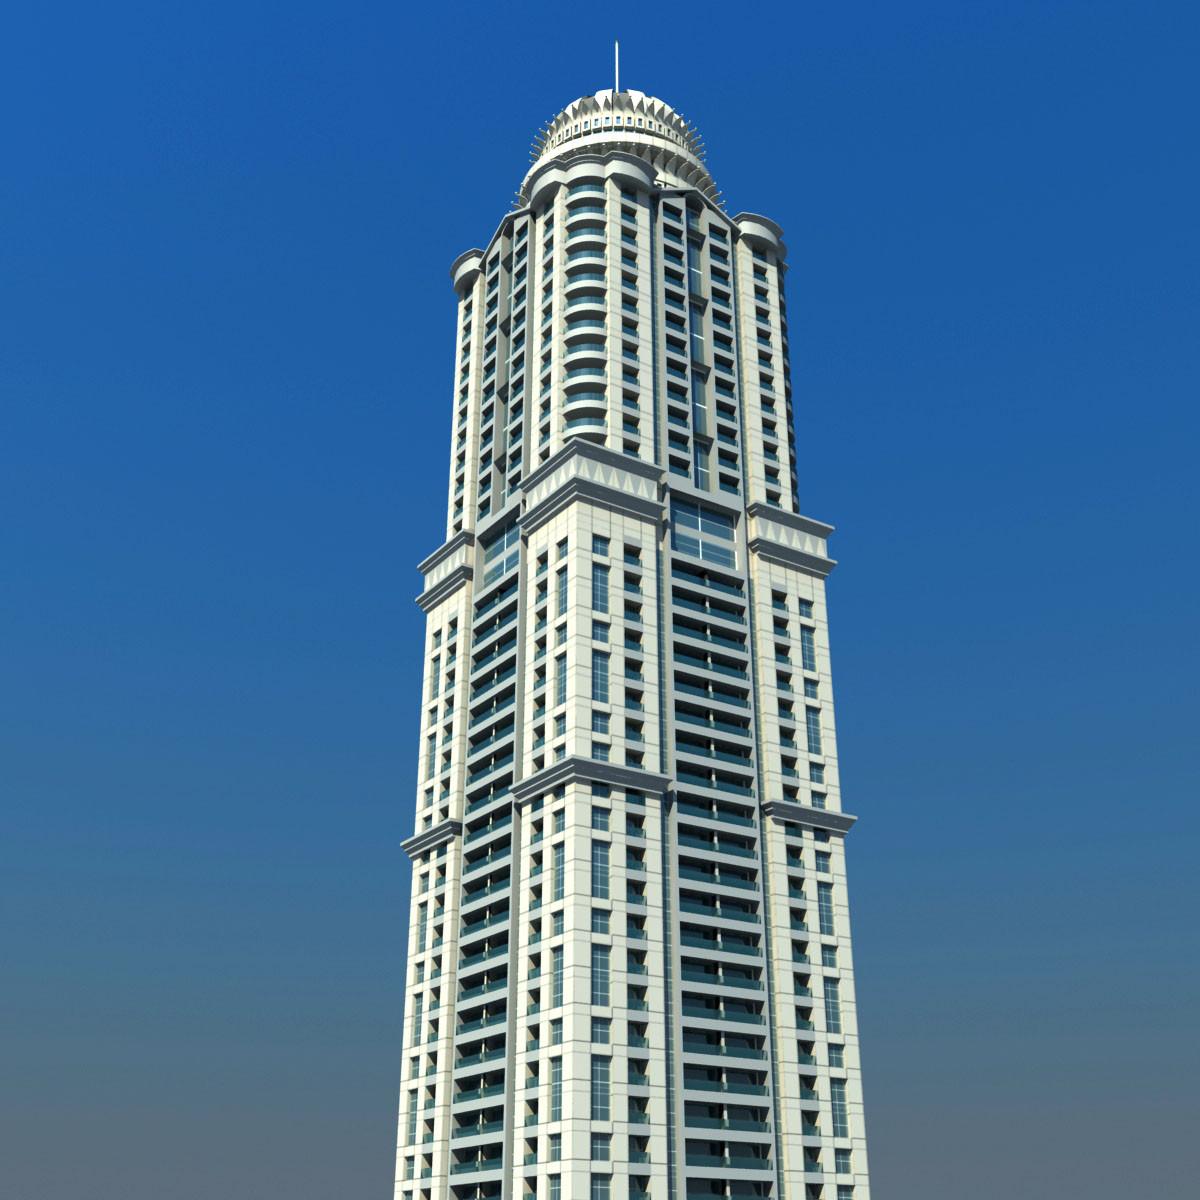 Empire clipart princess tower Architecture Dubai Tower Pinterest Princess